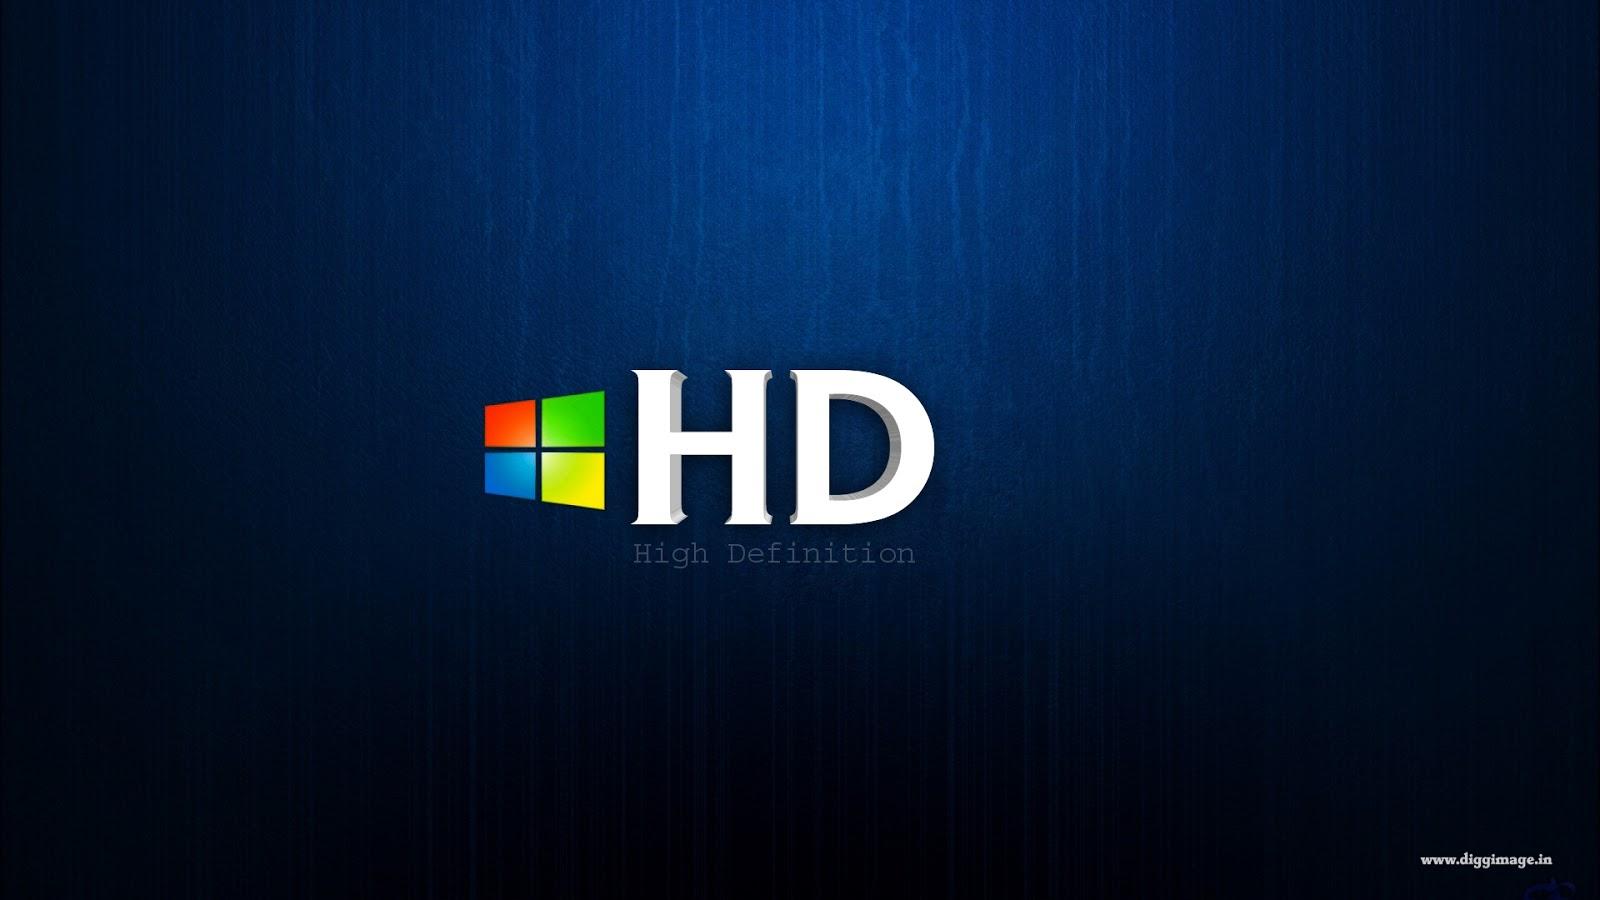 windows 3d hd logo wallpaper free download for desktop